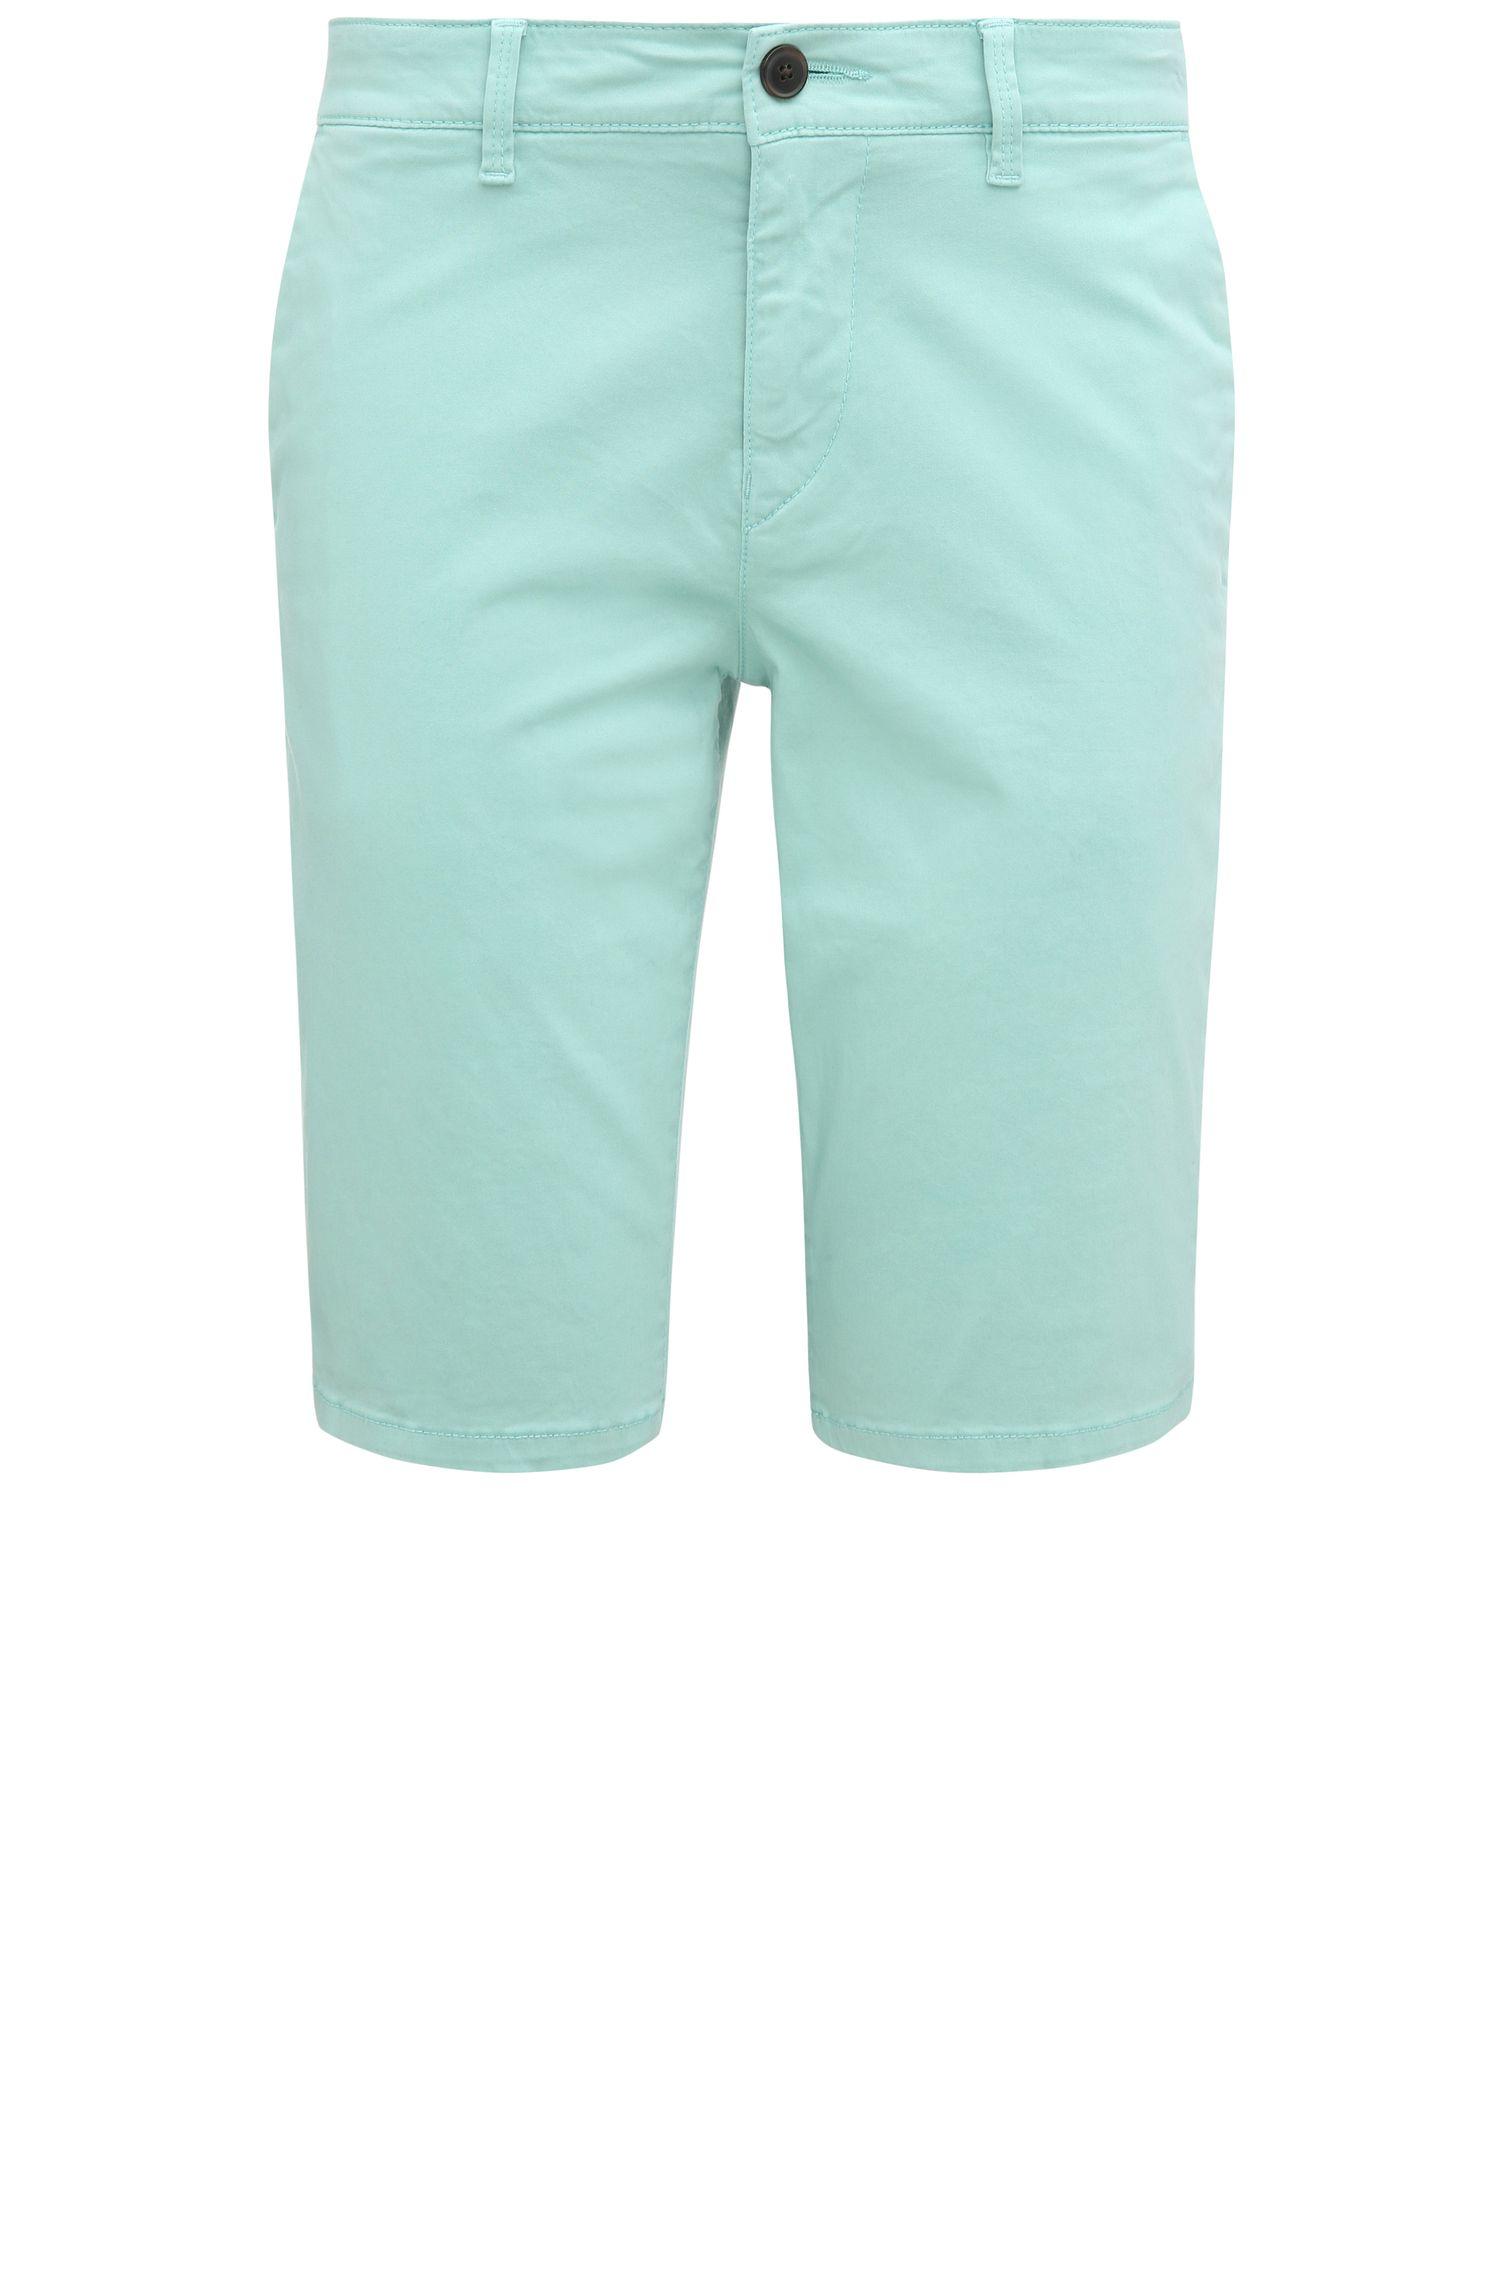 'Schino Slim Shorts D'   Slim Fit, Stretch Cotton Shorts